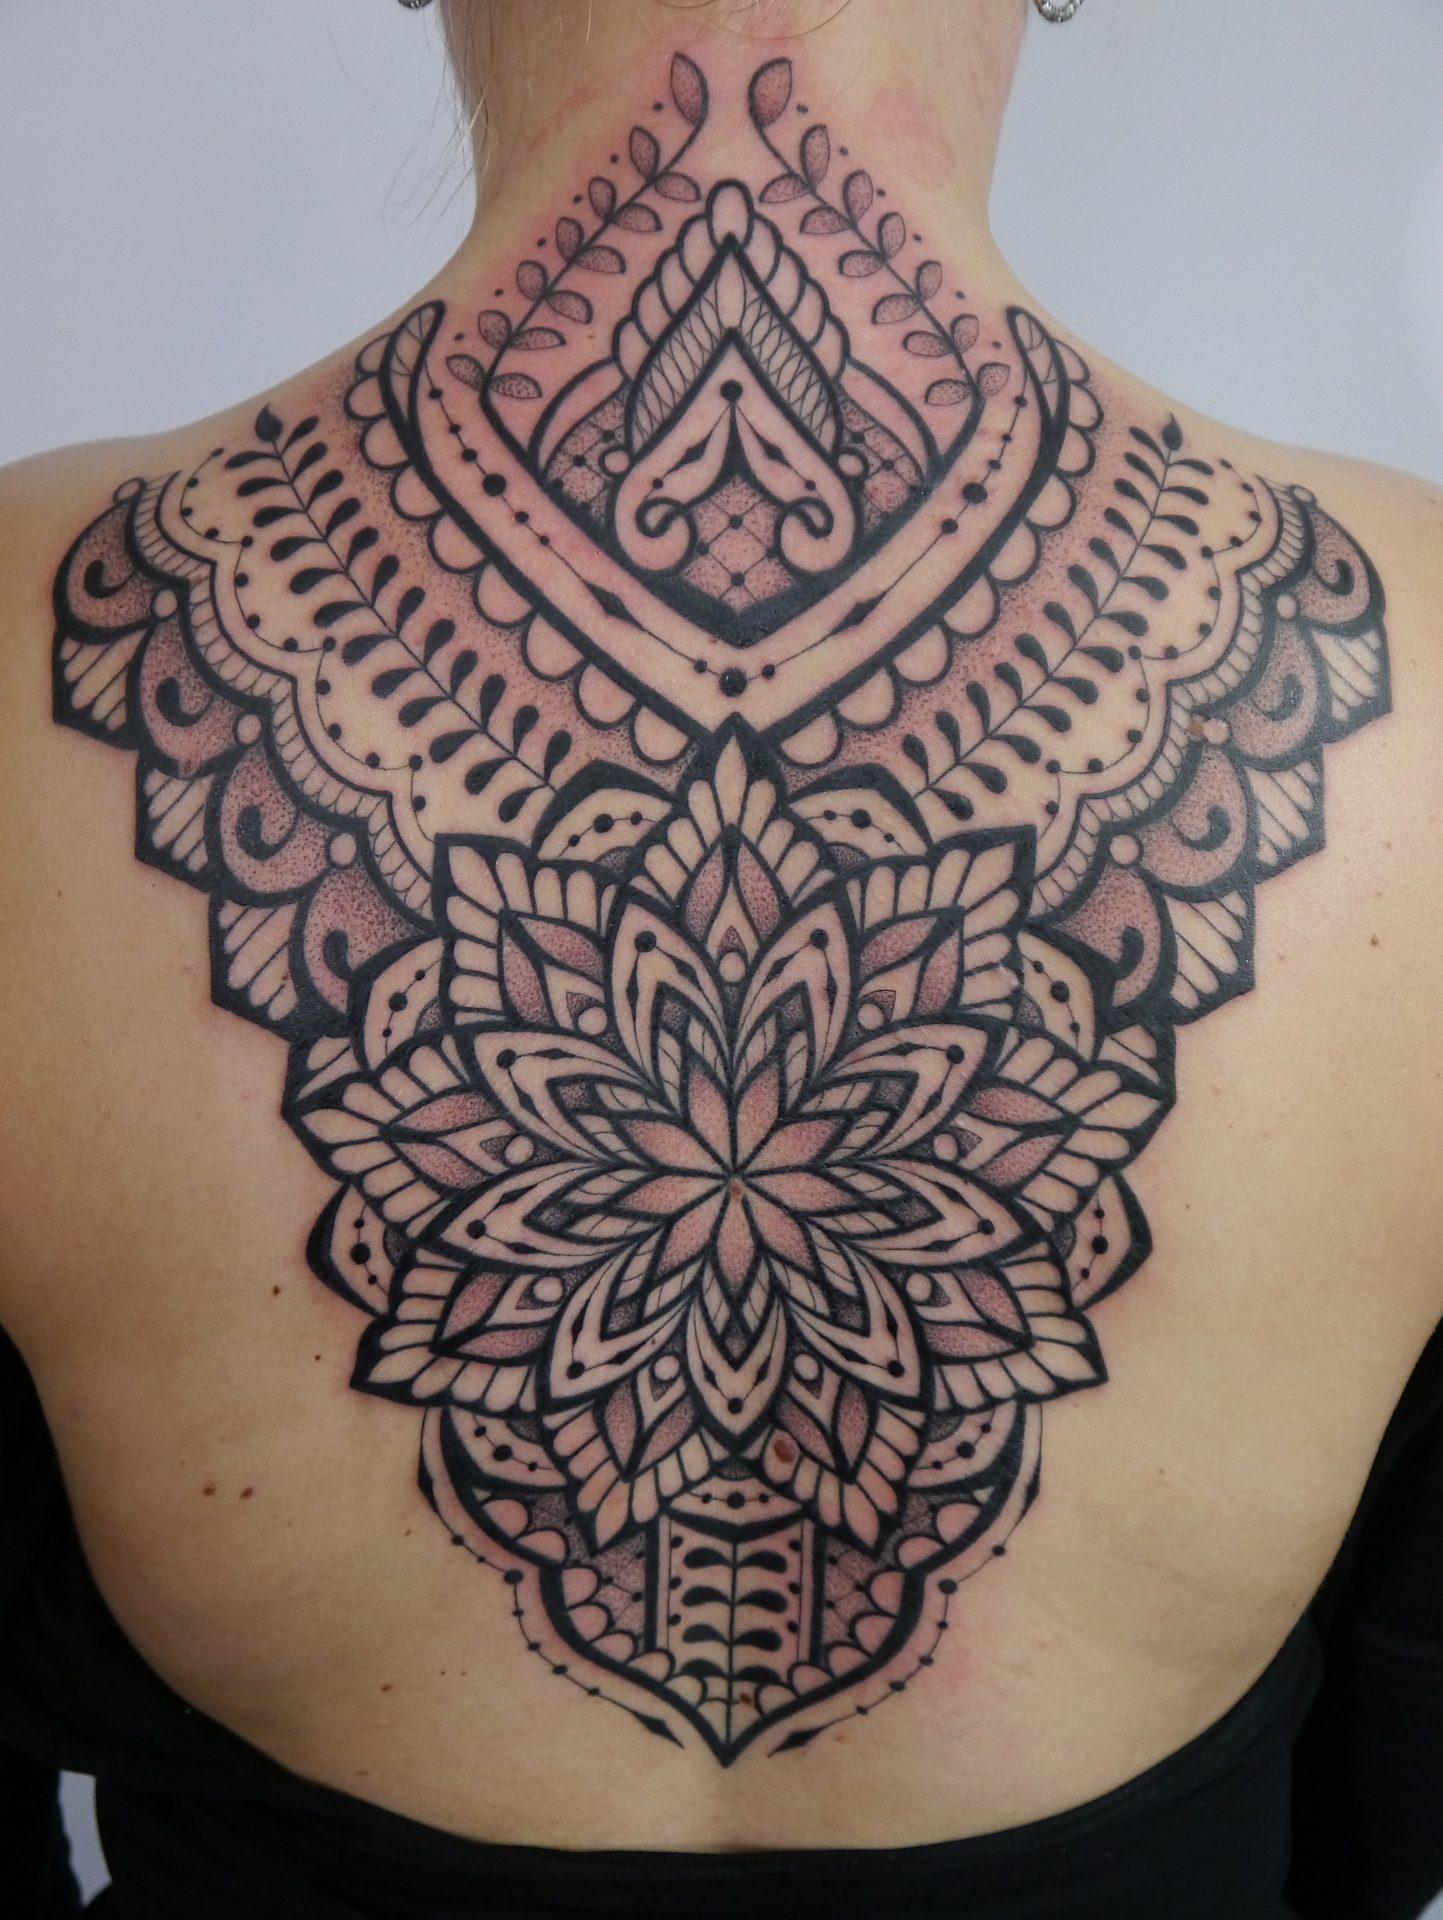 Ornamentowy na plecach w formie mandali